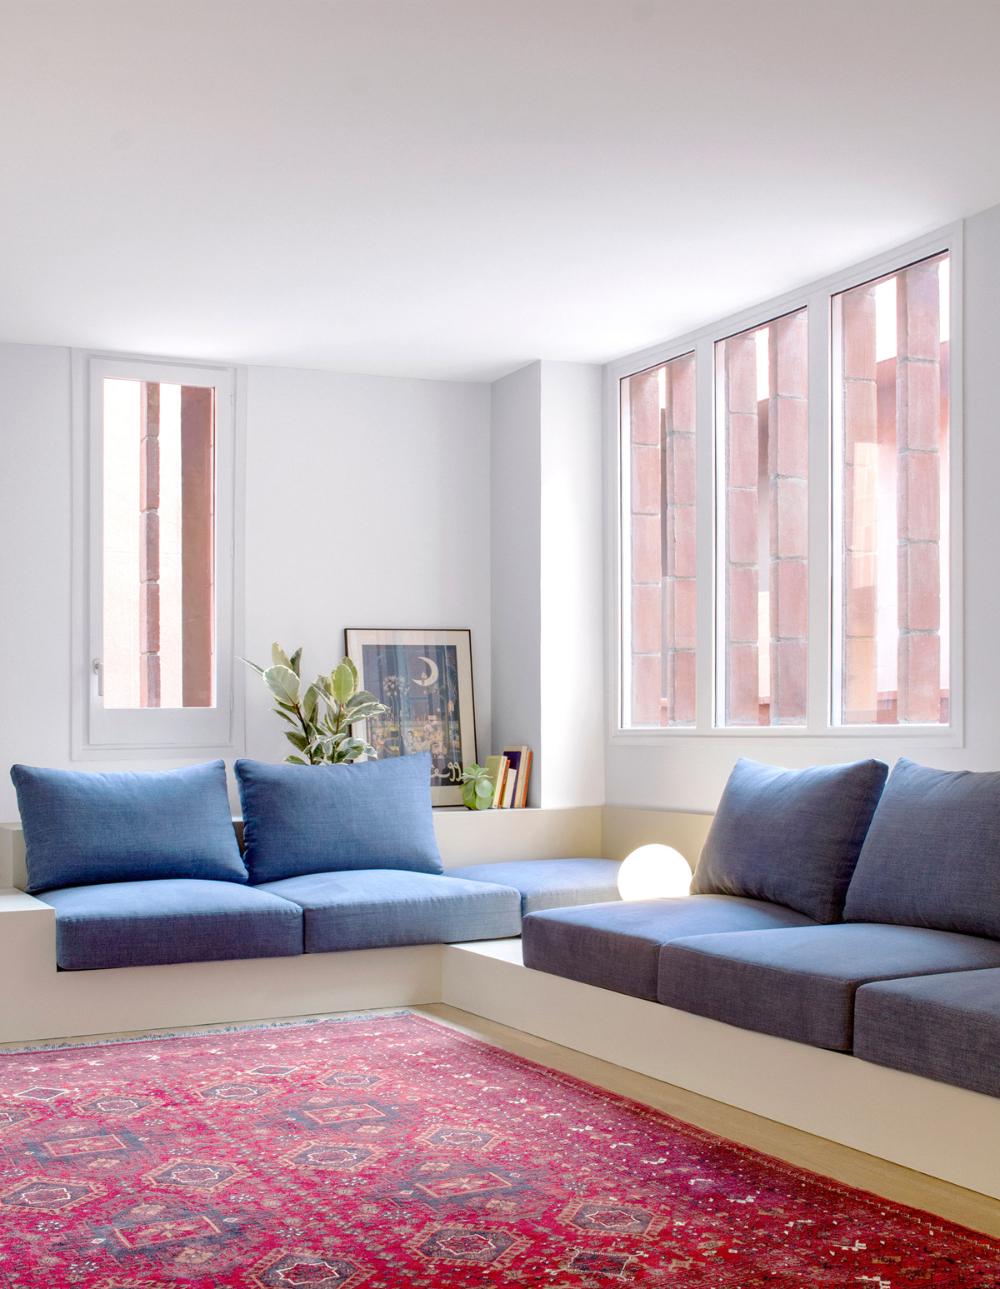 Bonell Doriga Renovation Of An Apartment In Walden 7 Hic Arquitectura In 2020 Interior Renovations Apartment Interior